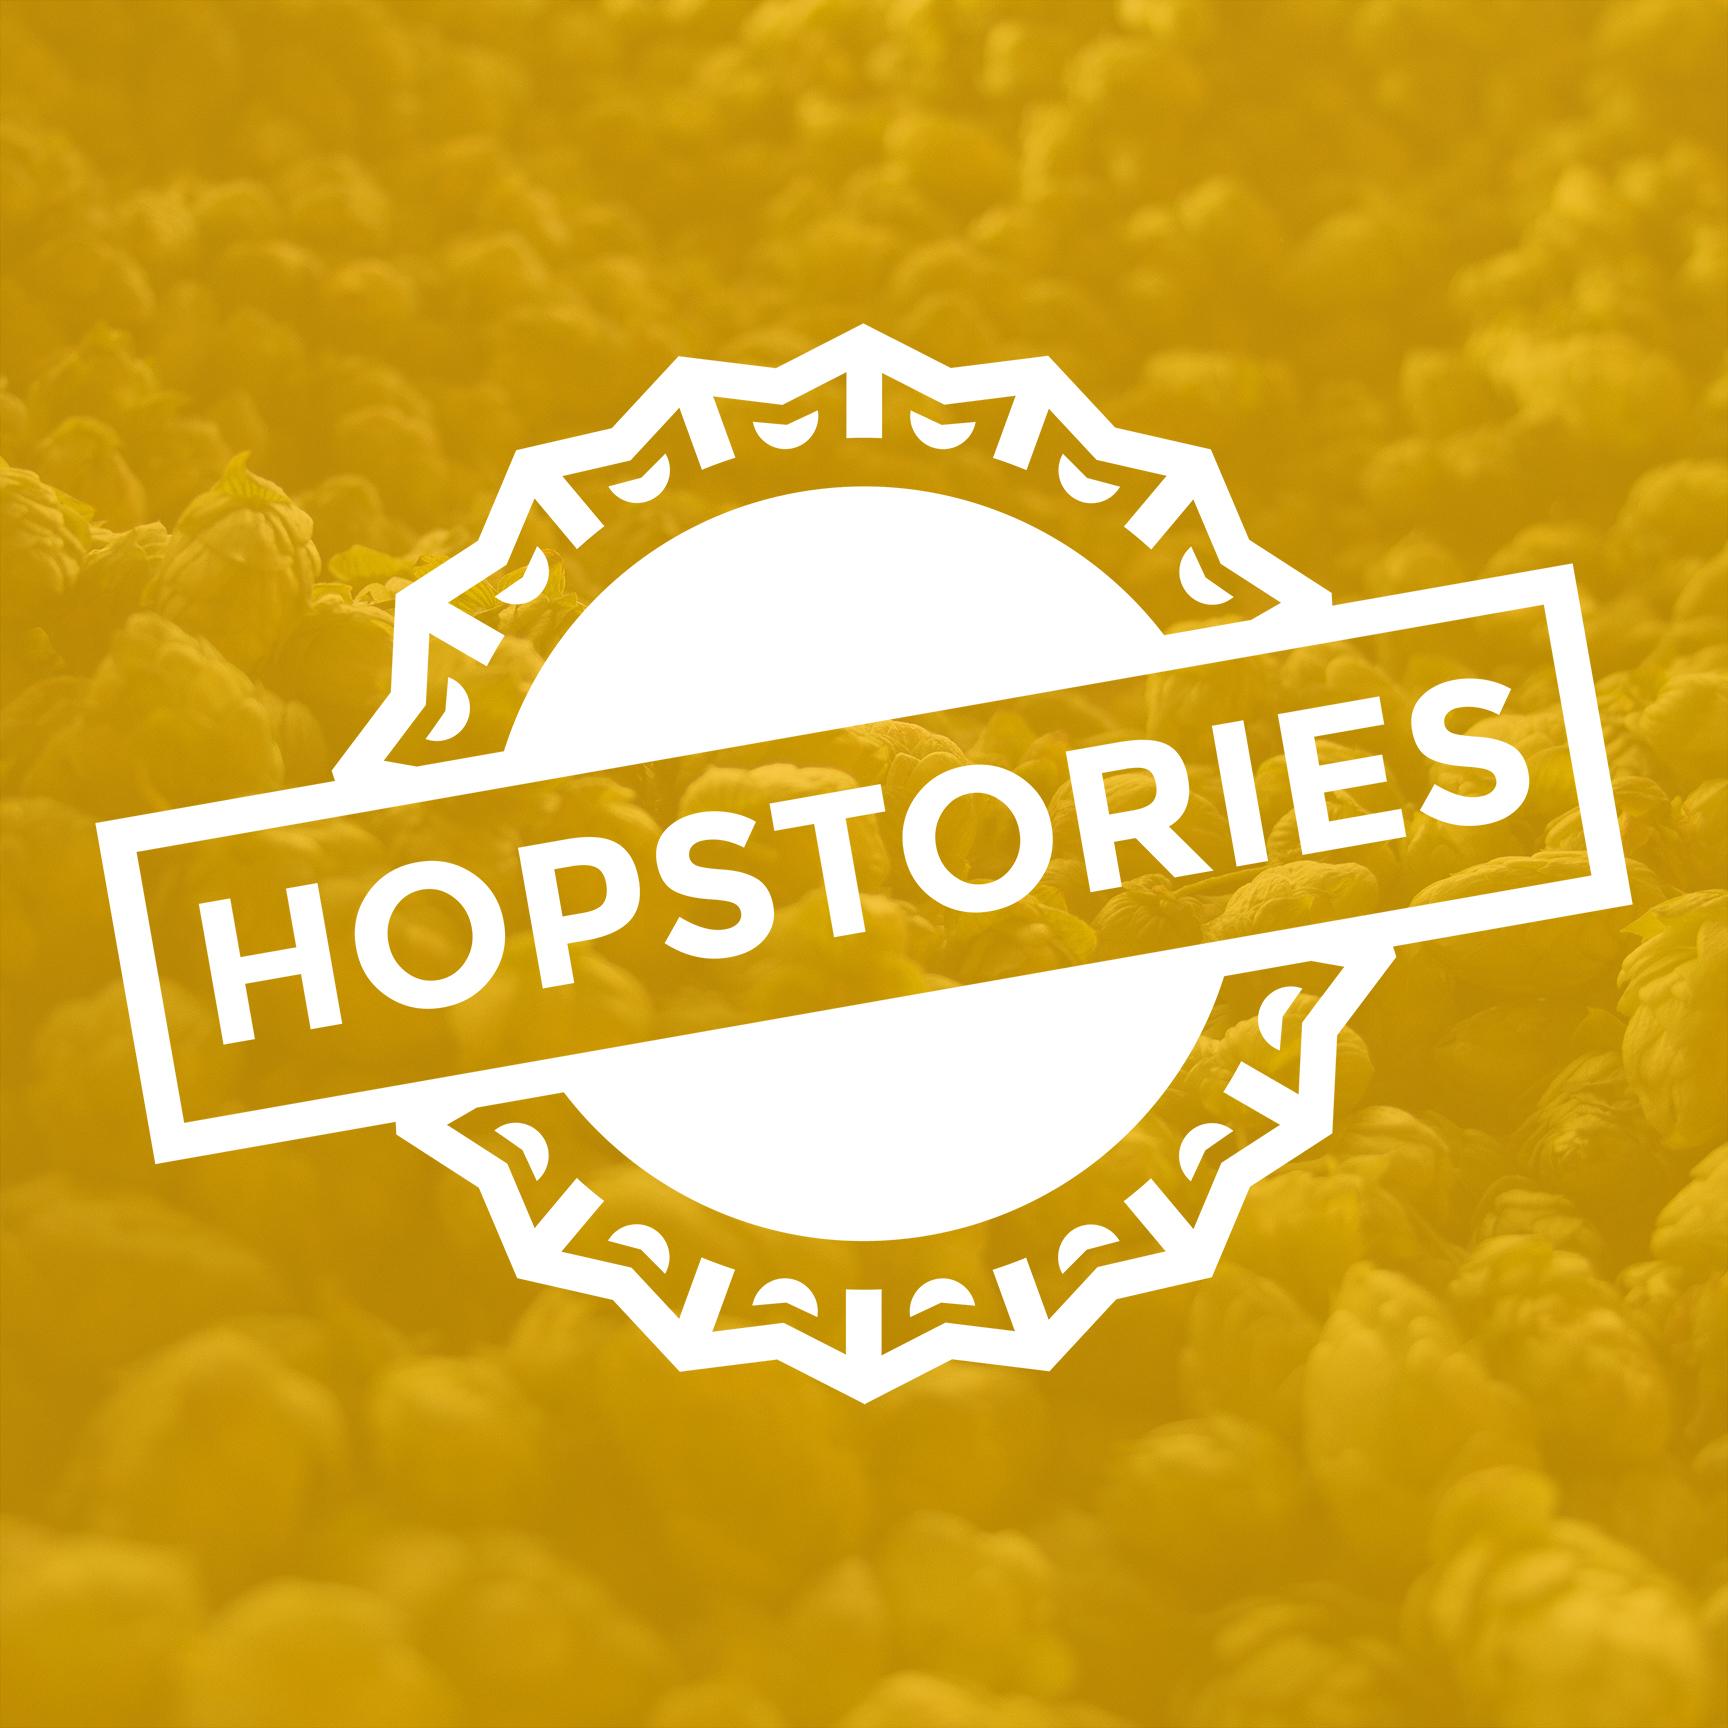 hopstories_square.jpg